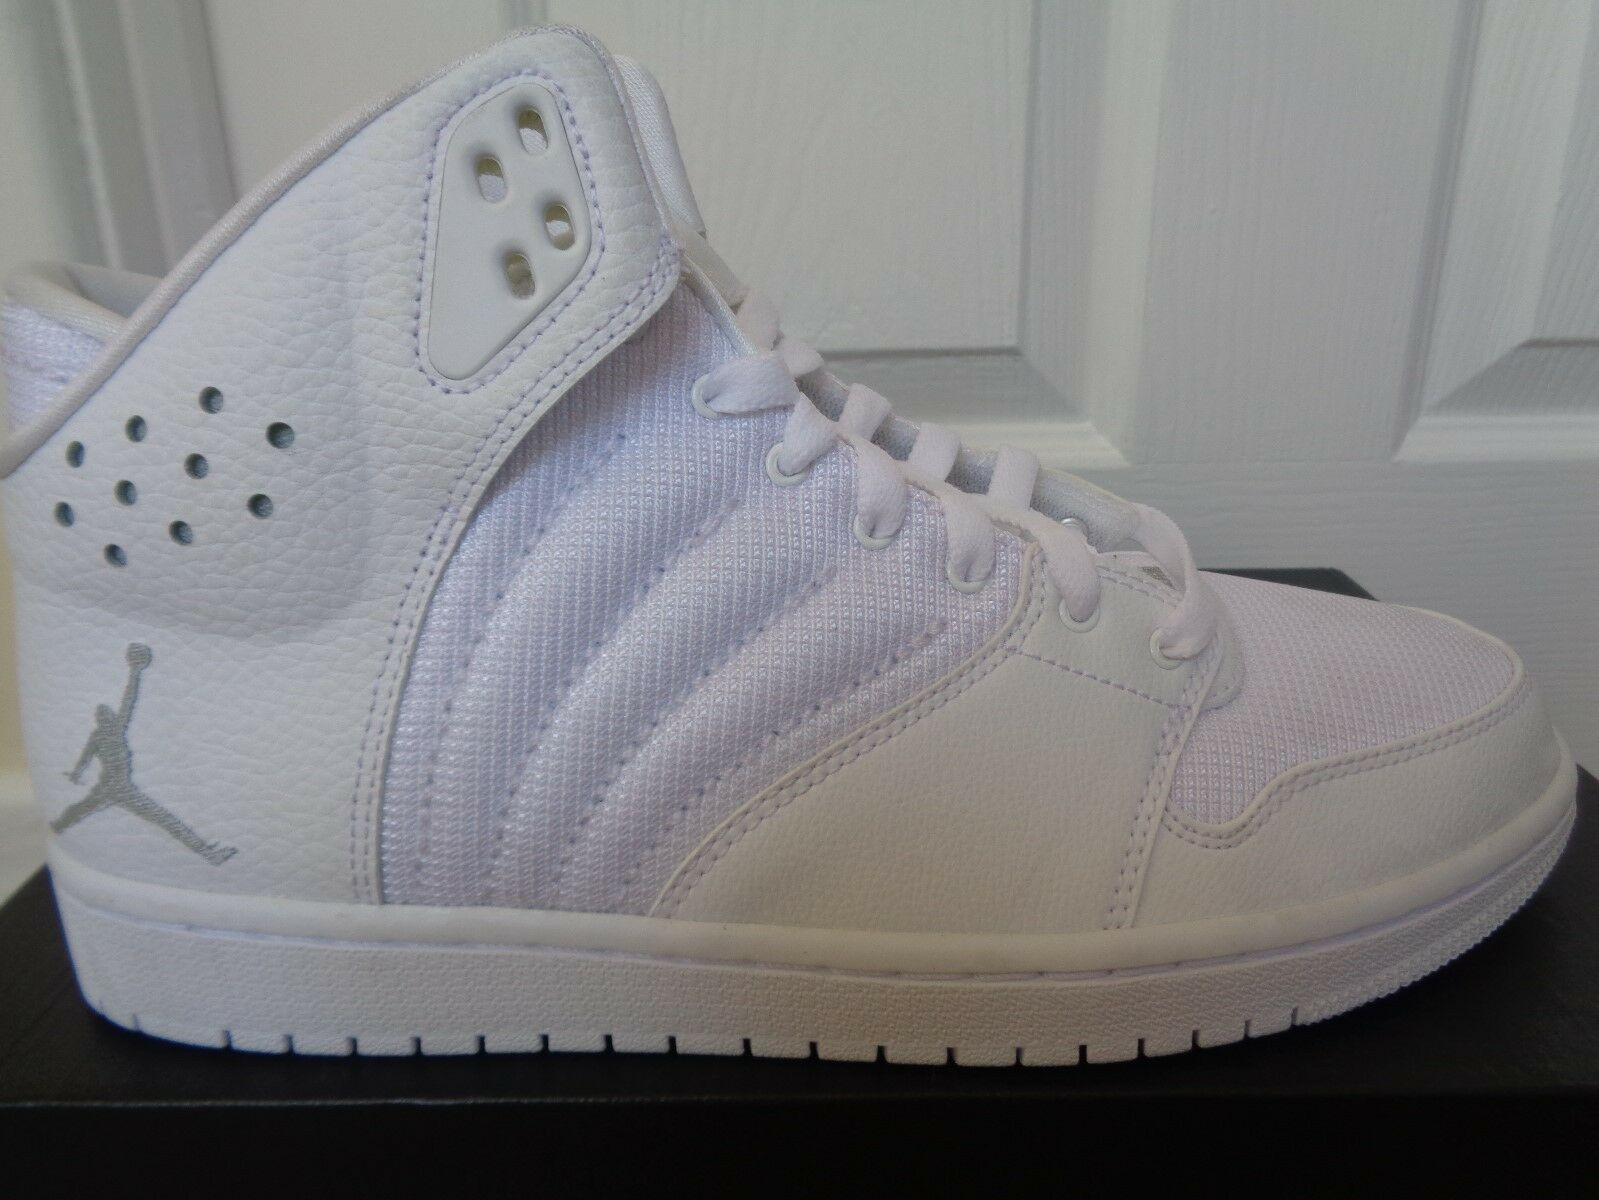 Nike Jordan 1 Flight 4 trainers Turnschuhe 820135 100 uk 7.5 eu 42 us 8.5 NEW+BOX